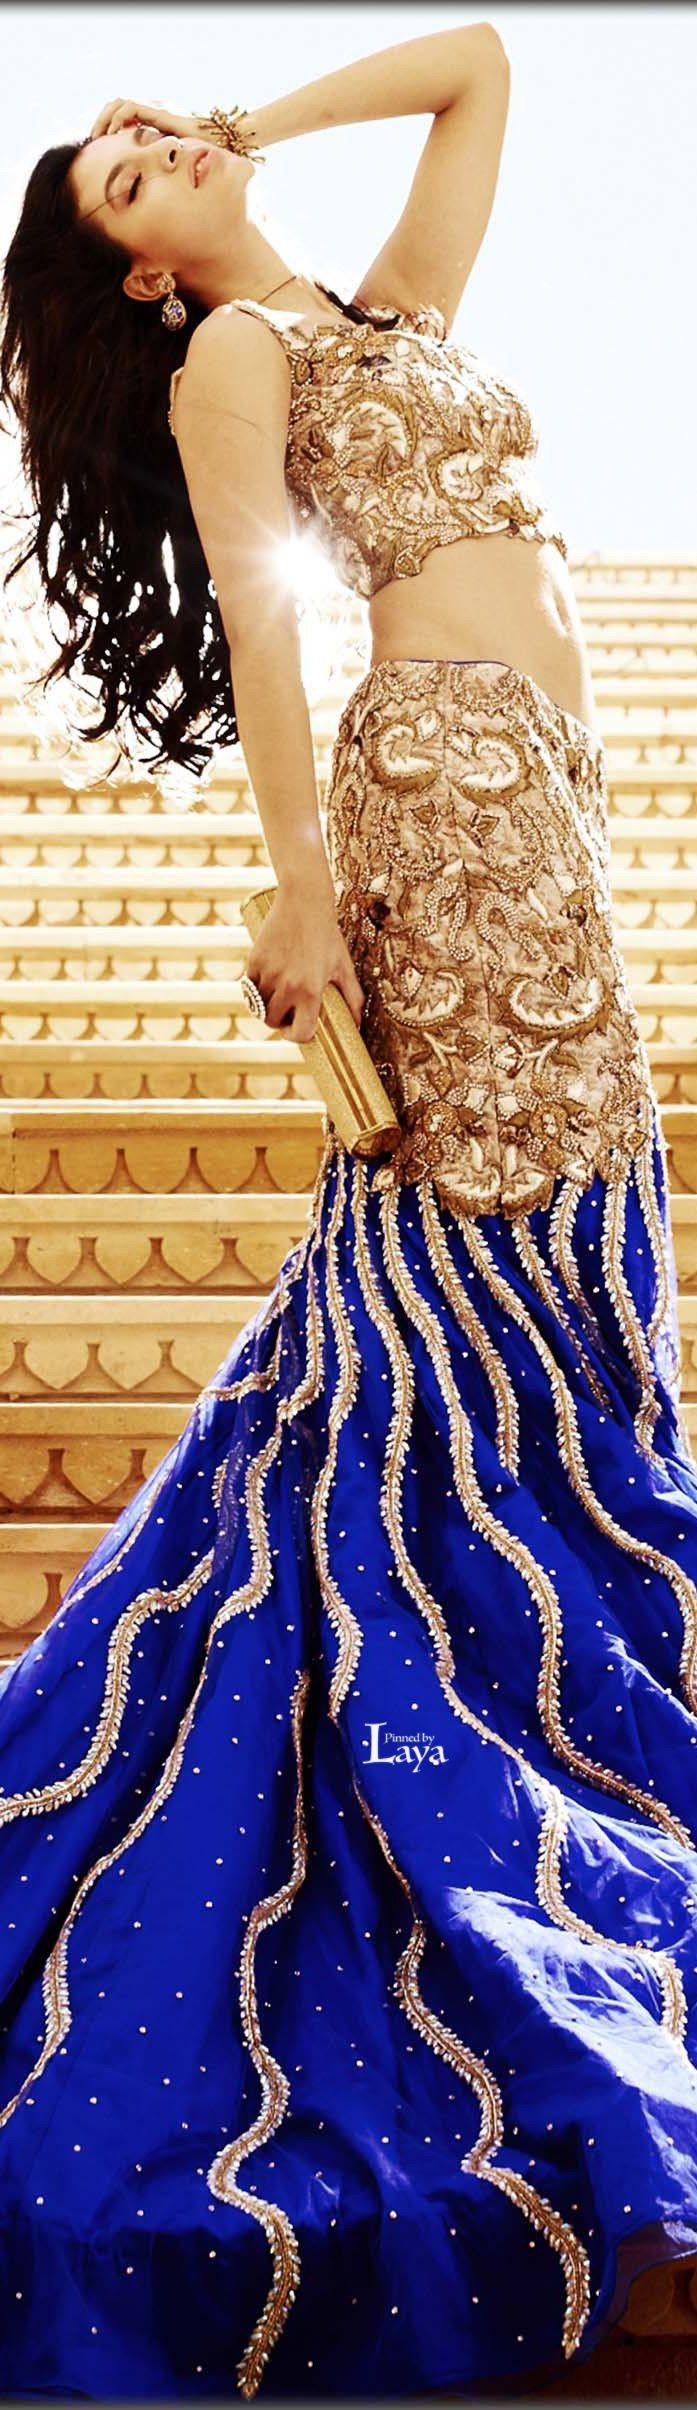 Navy blue mermaid lehenga. Indian wedding reception outfit